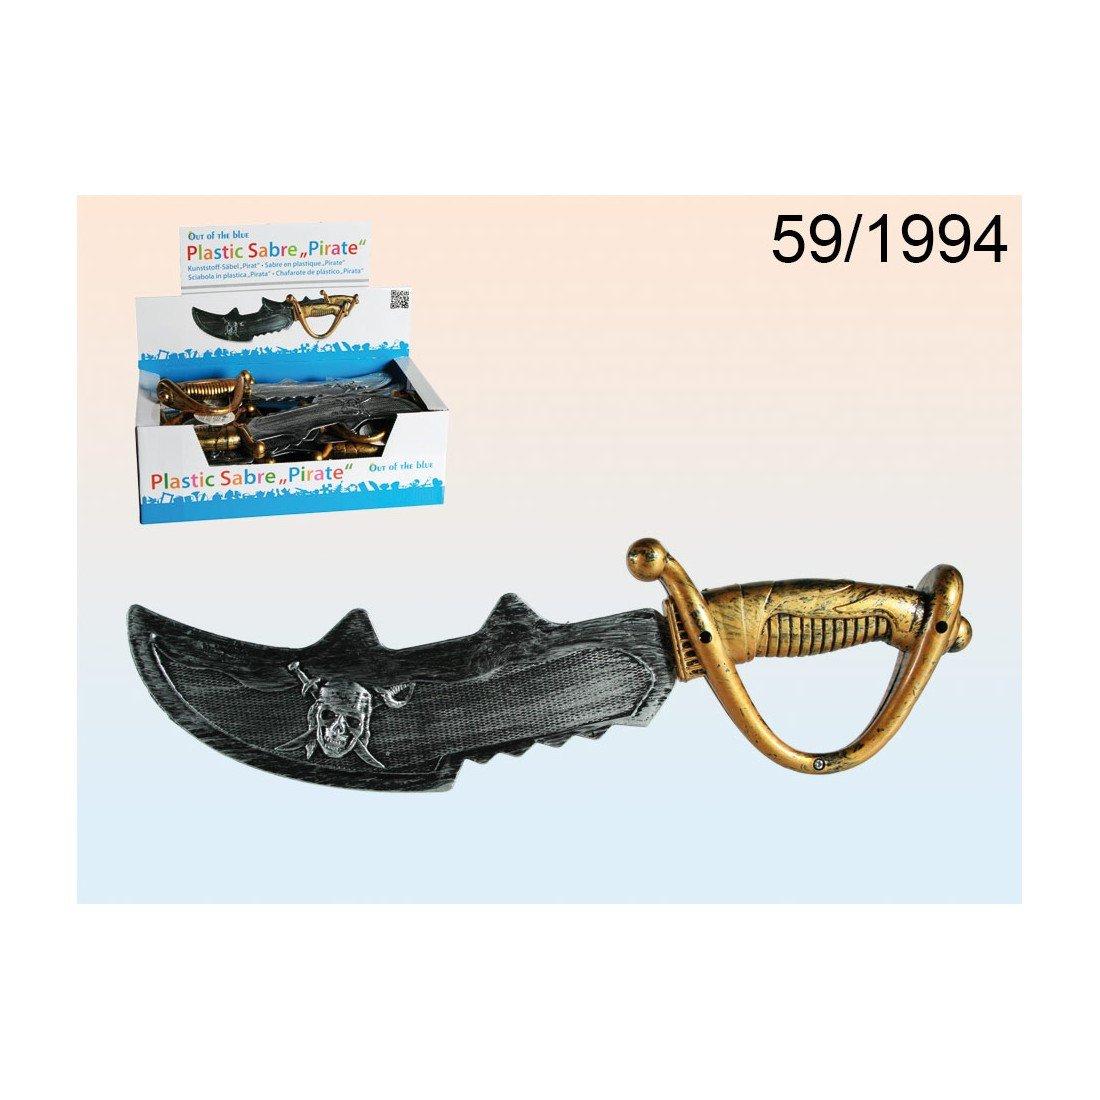 Chafarote de Plástico - espada pirata 38 cm ideal para disfraz ...